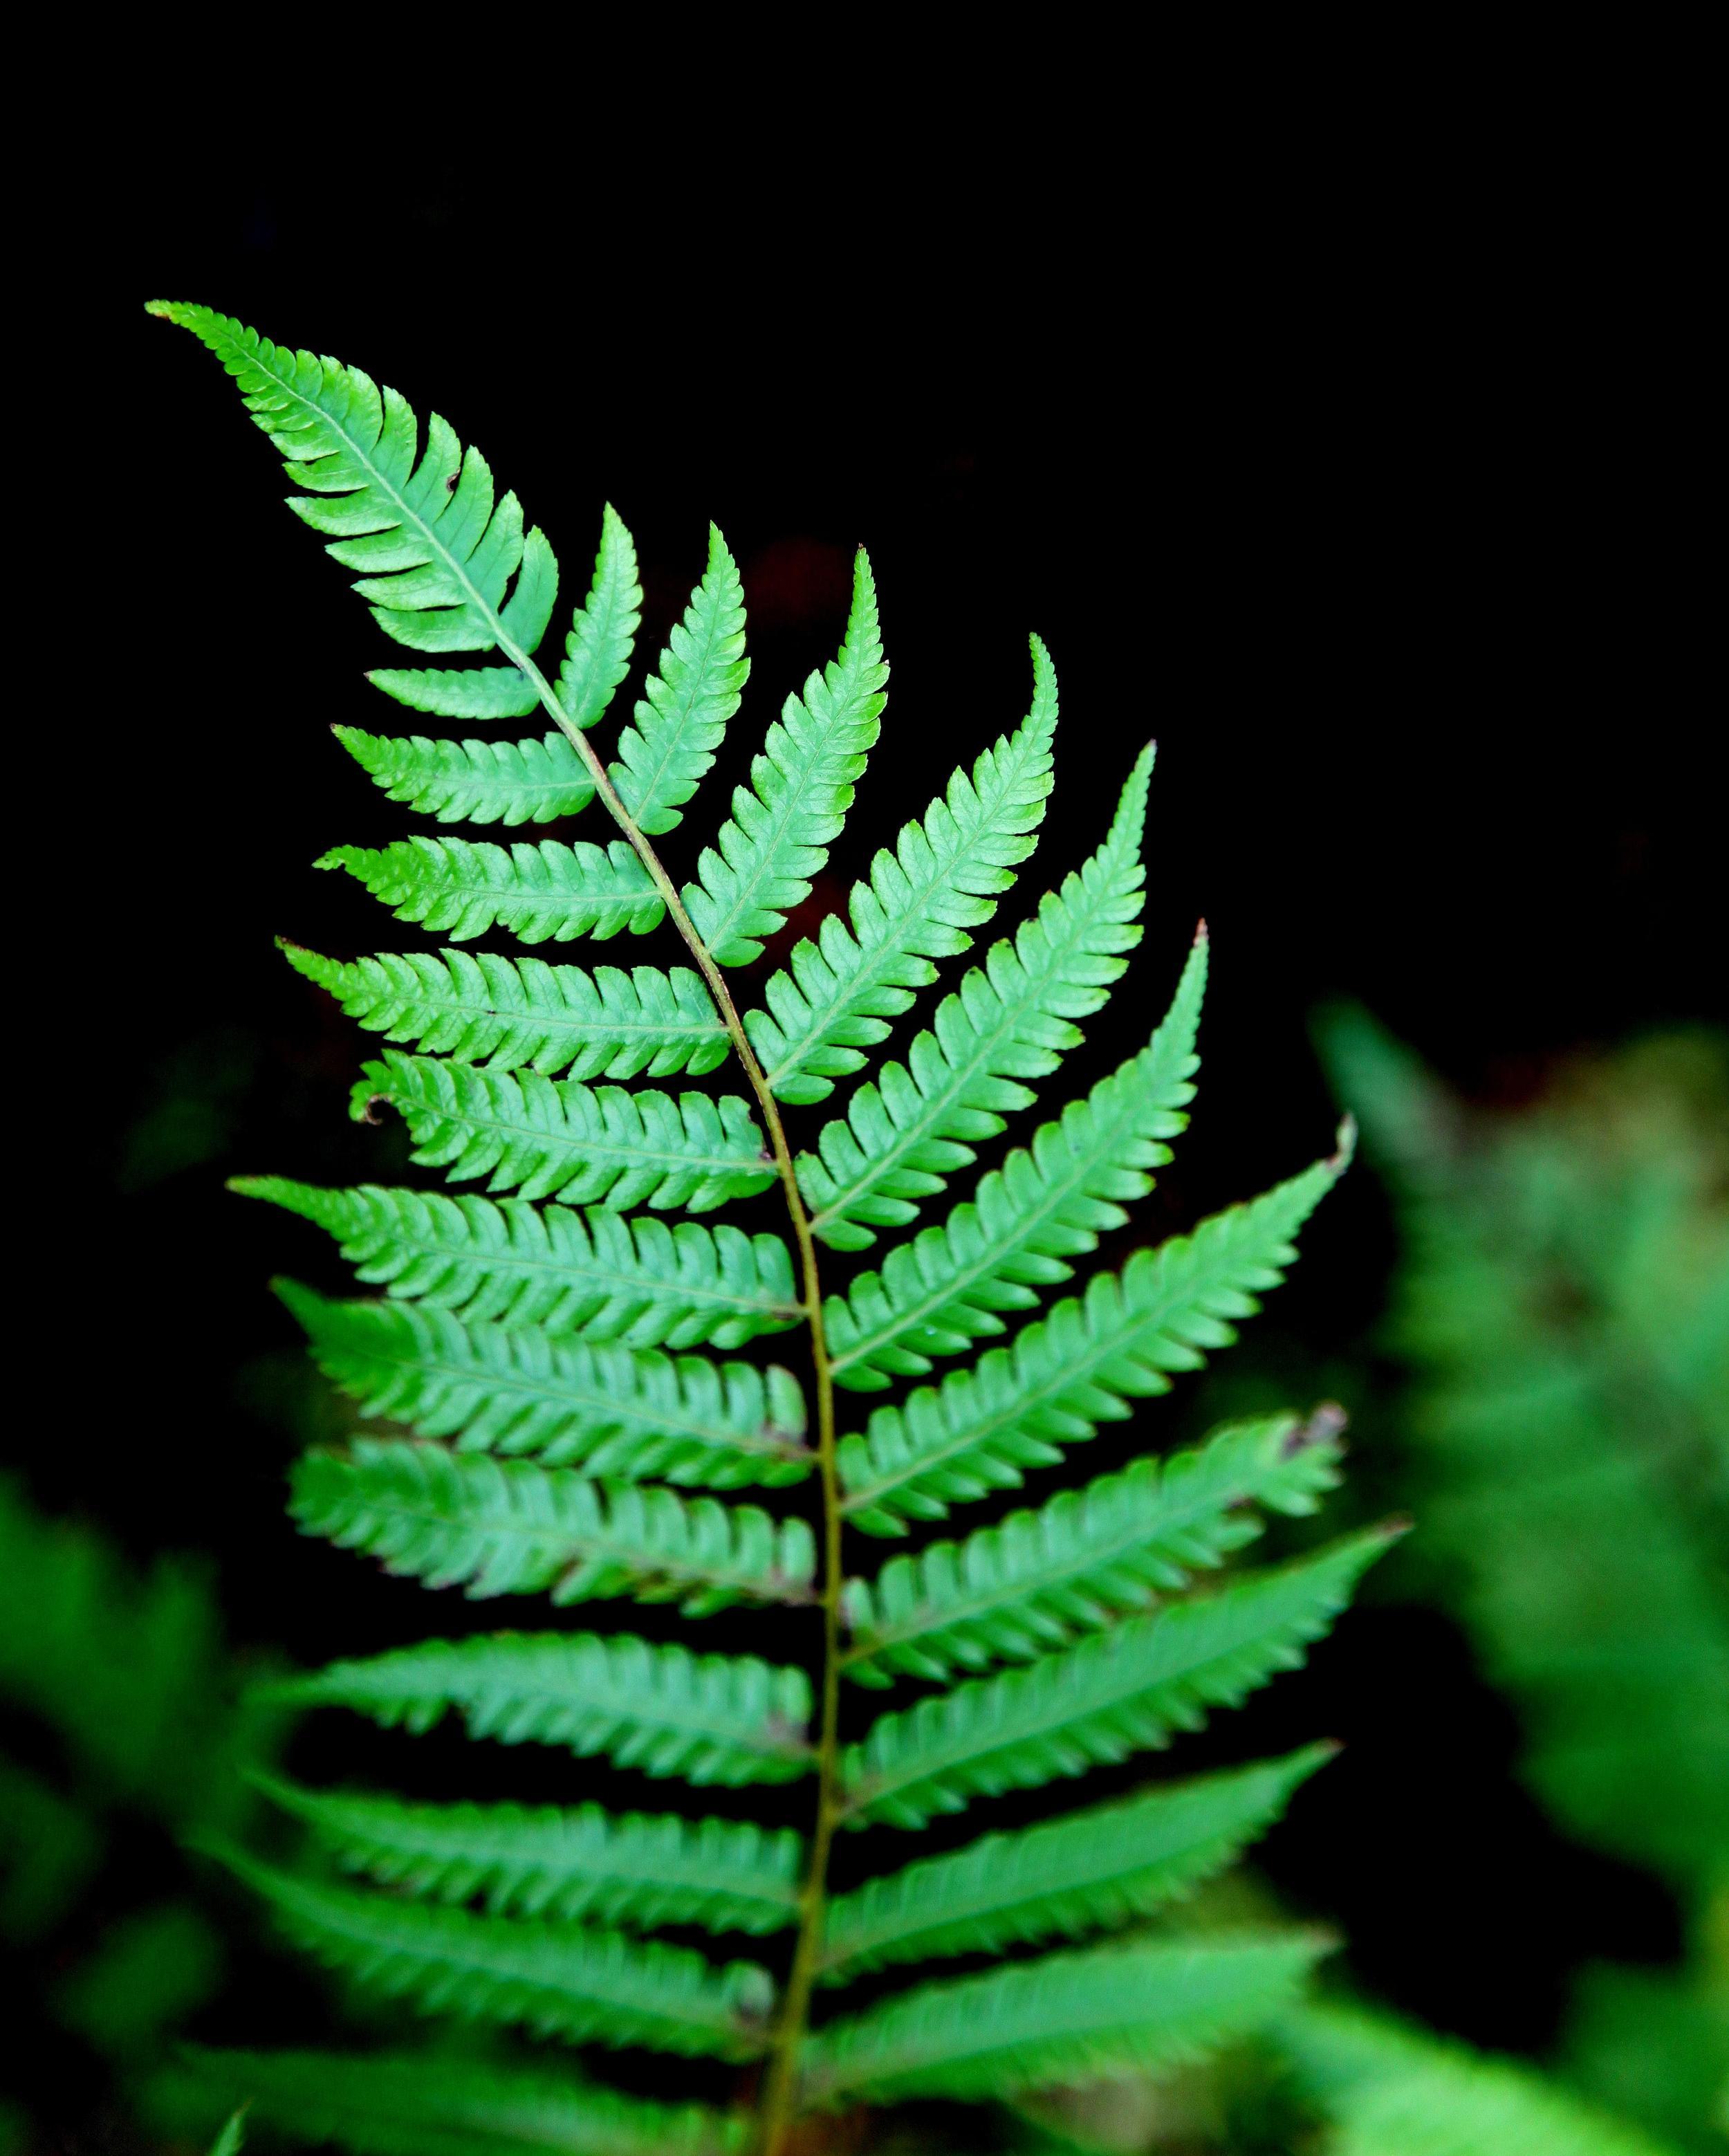 green_fern.jpg